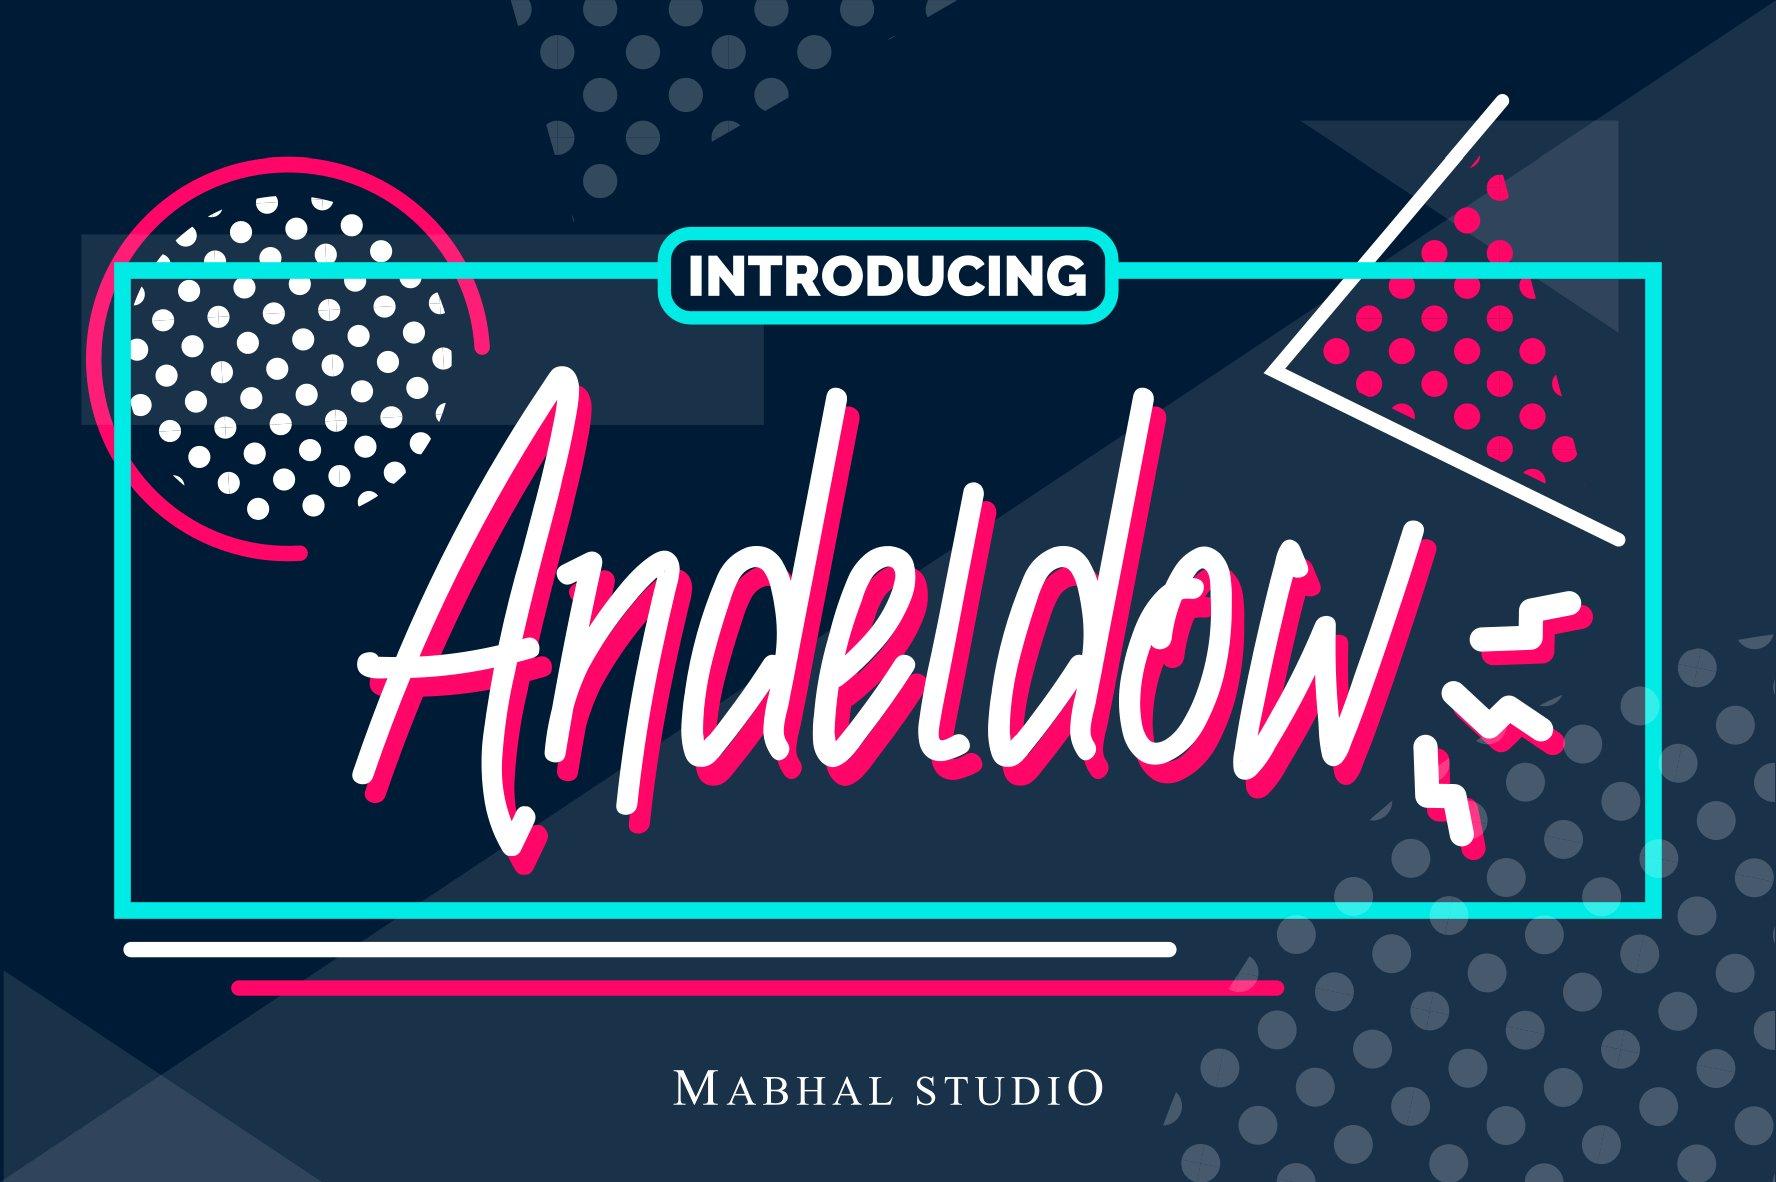 Andeldow example image 1